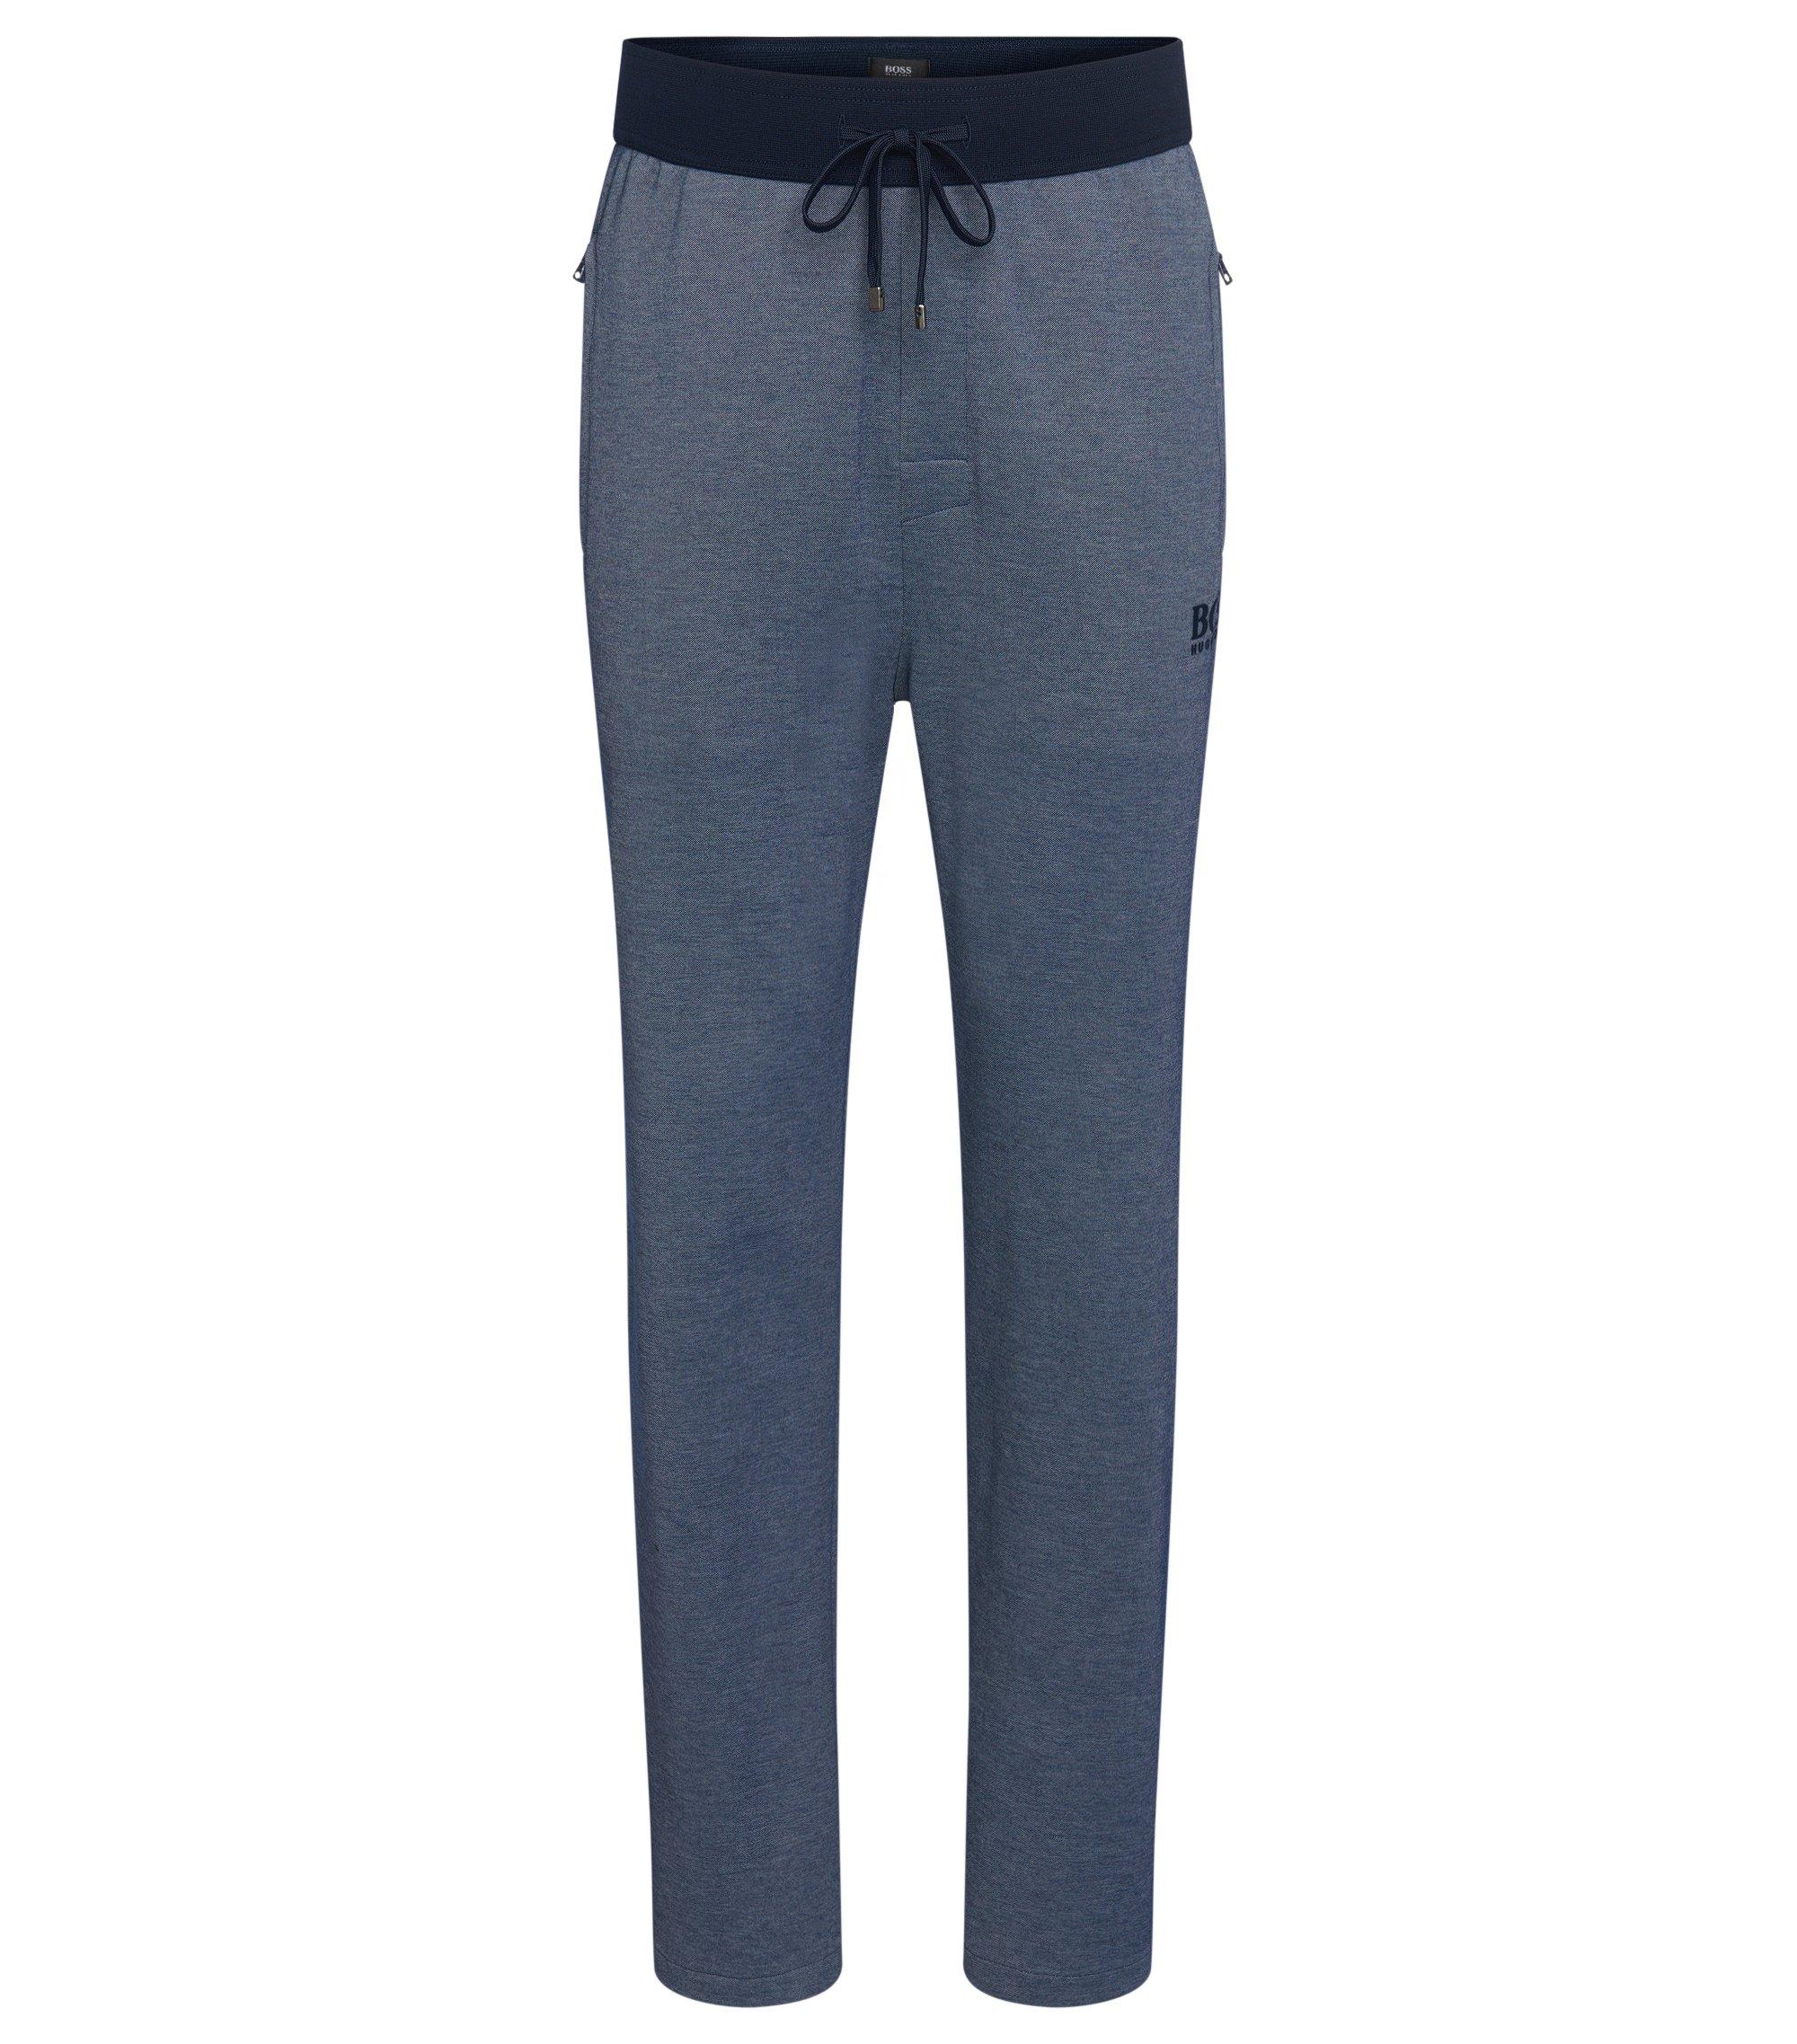 Cotton Blend Drawstring Lounge Pant | Long Pant, Open Blue